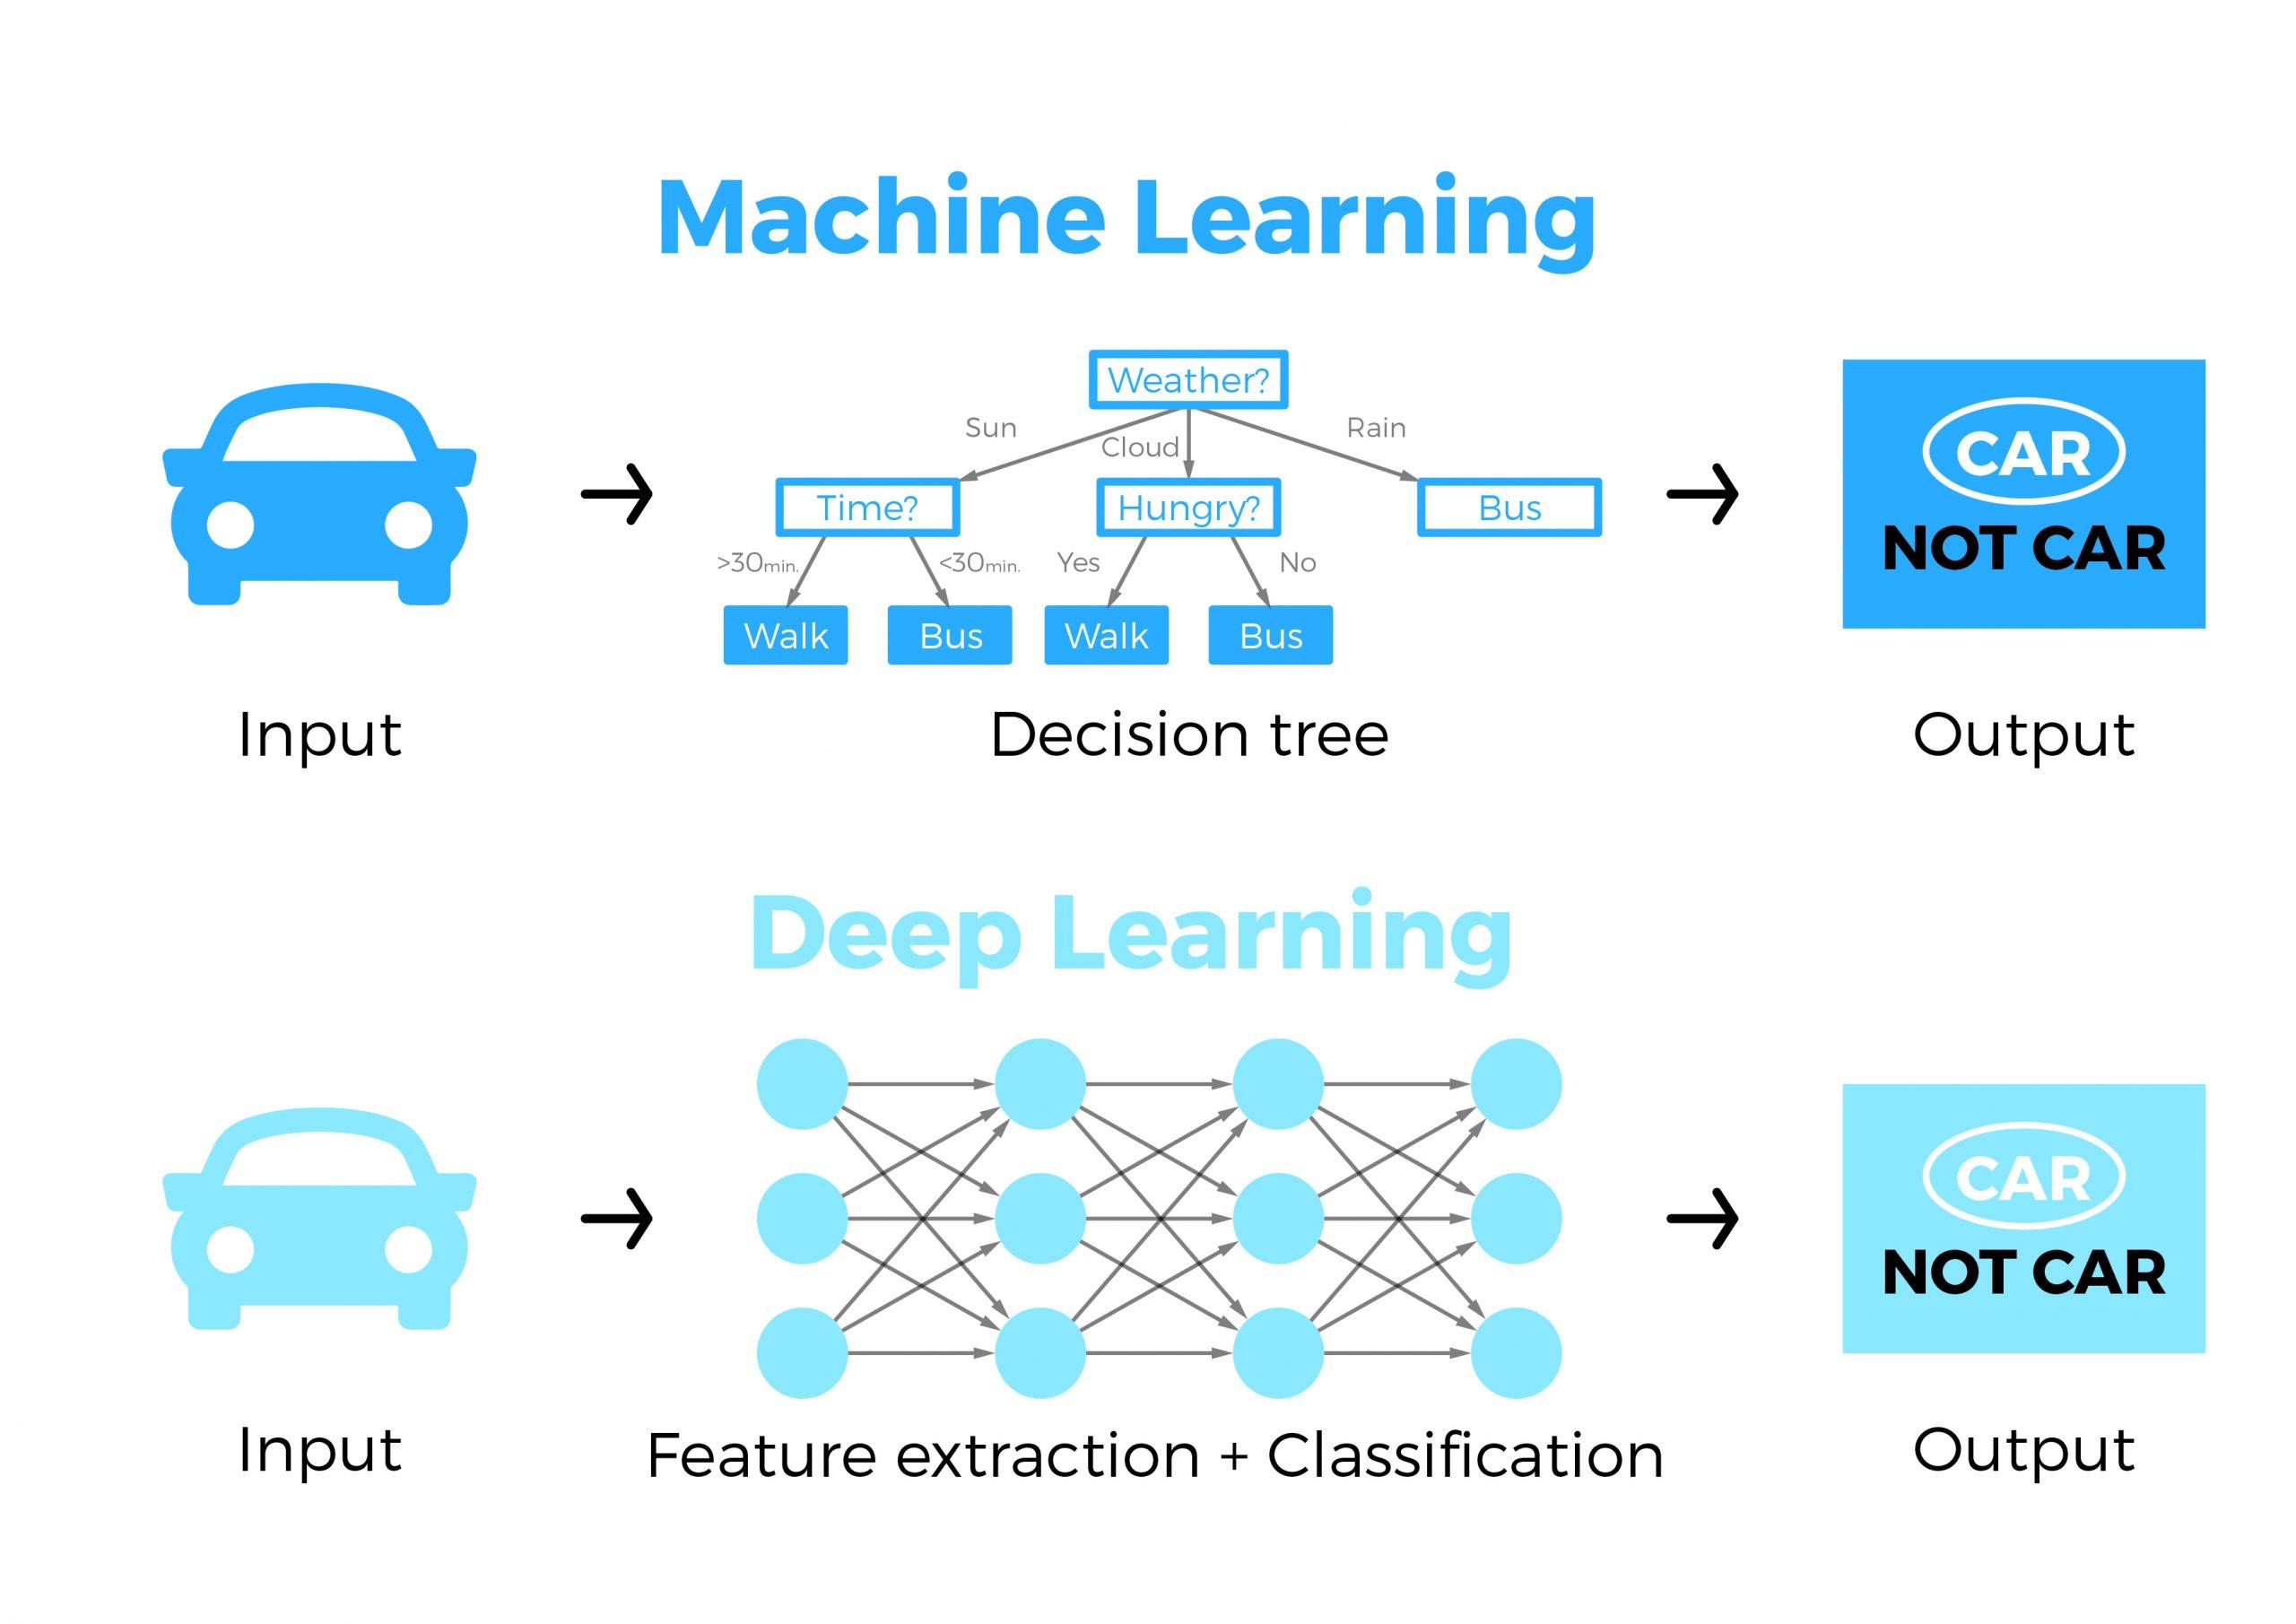 Kotlin DL Version 0.2: Functional API, Model Zoo With ResNet and MobileNet, Idiomatic Kotlin DSL for Image Preprocessing